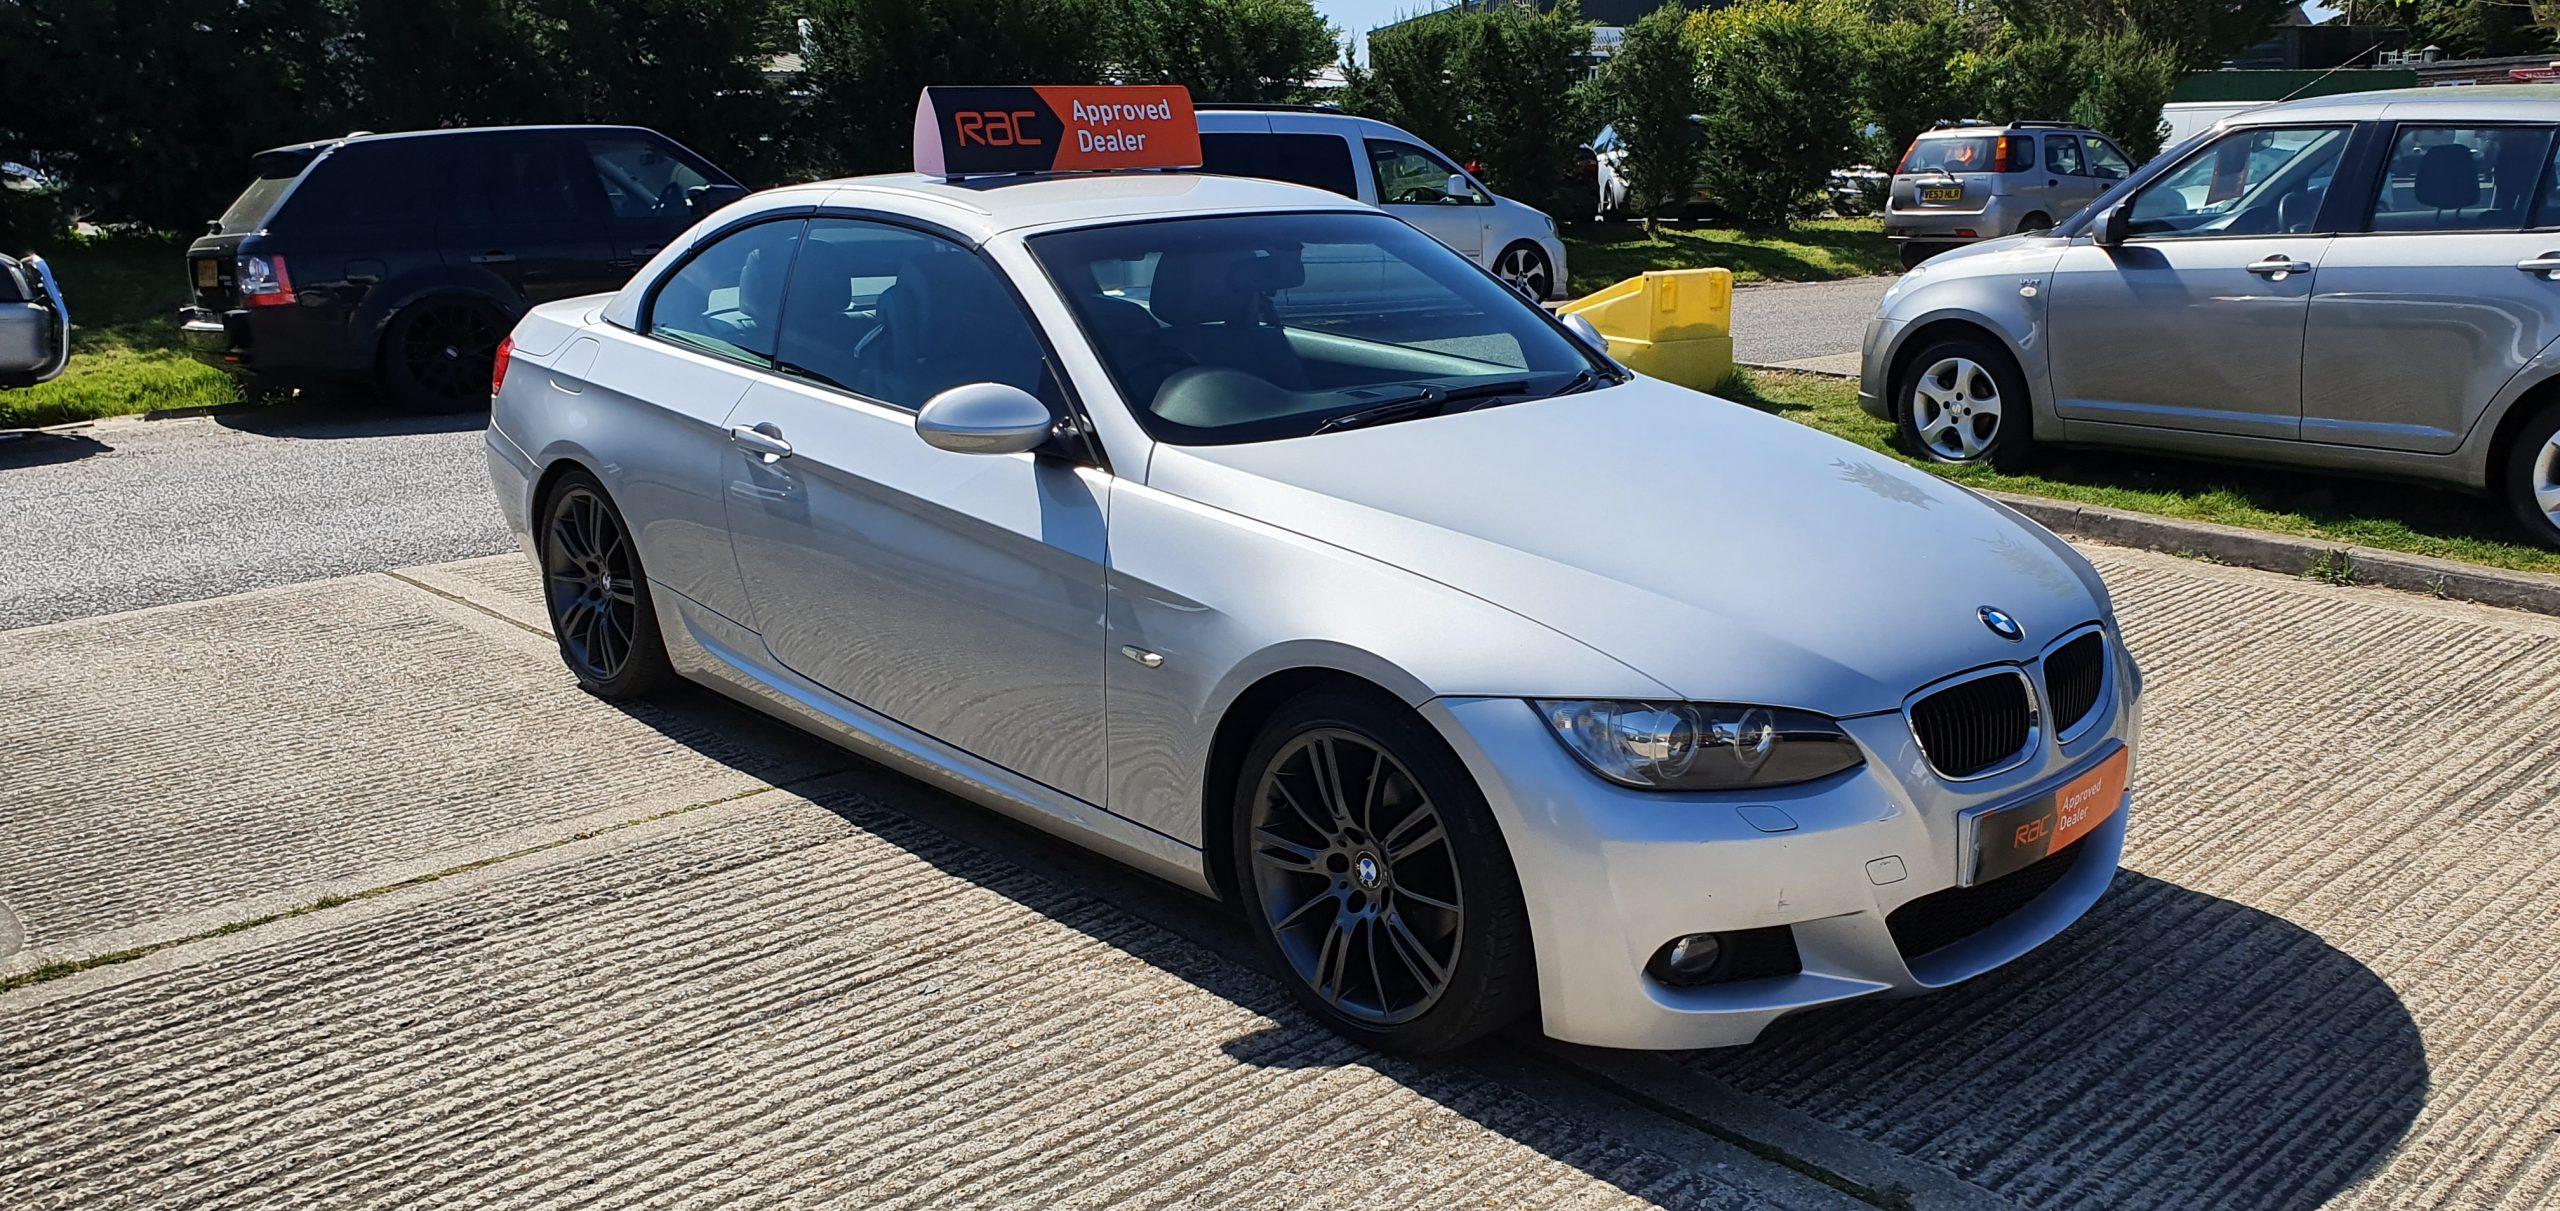 2009/09 BMW 320I M Sport Cabriolet, 2.0, petrol,  manual, 45500 miles, full service history, 2 keys, HPI clear